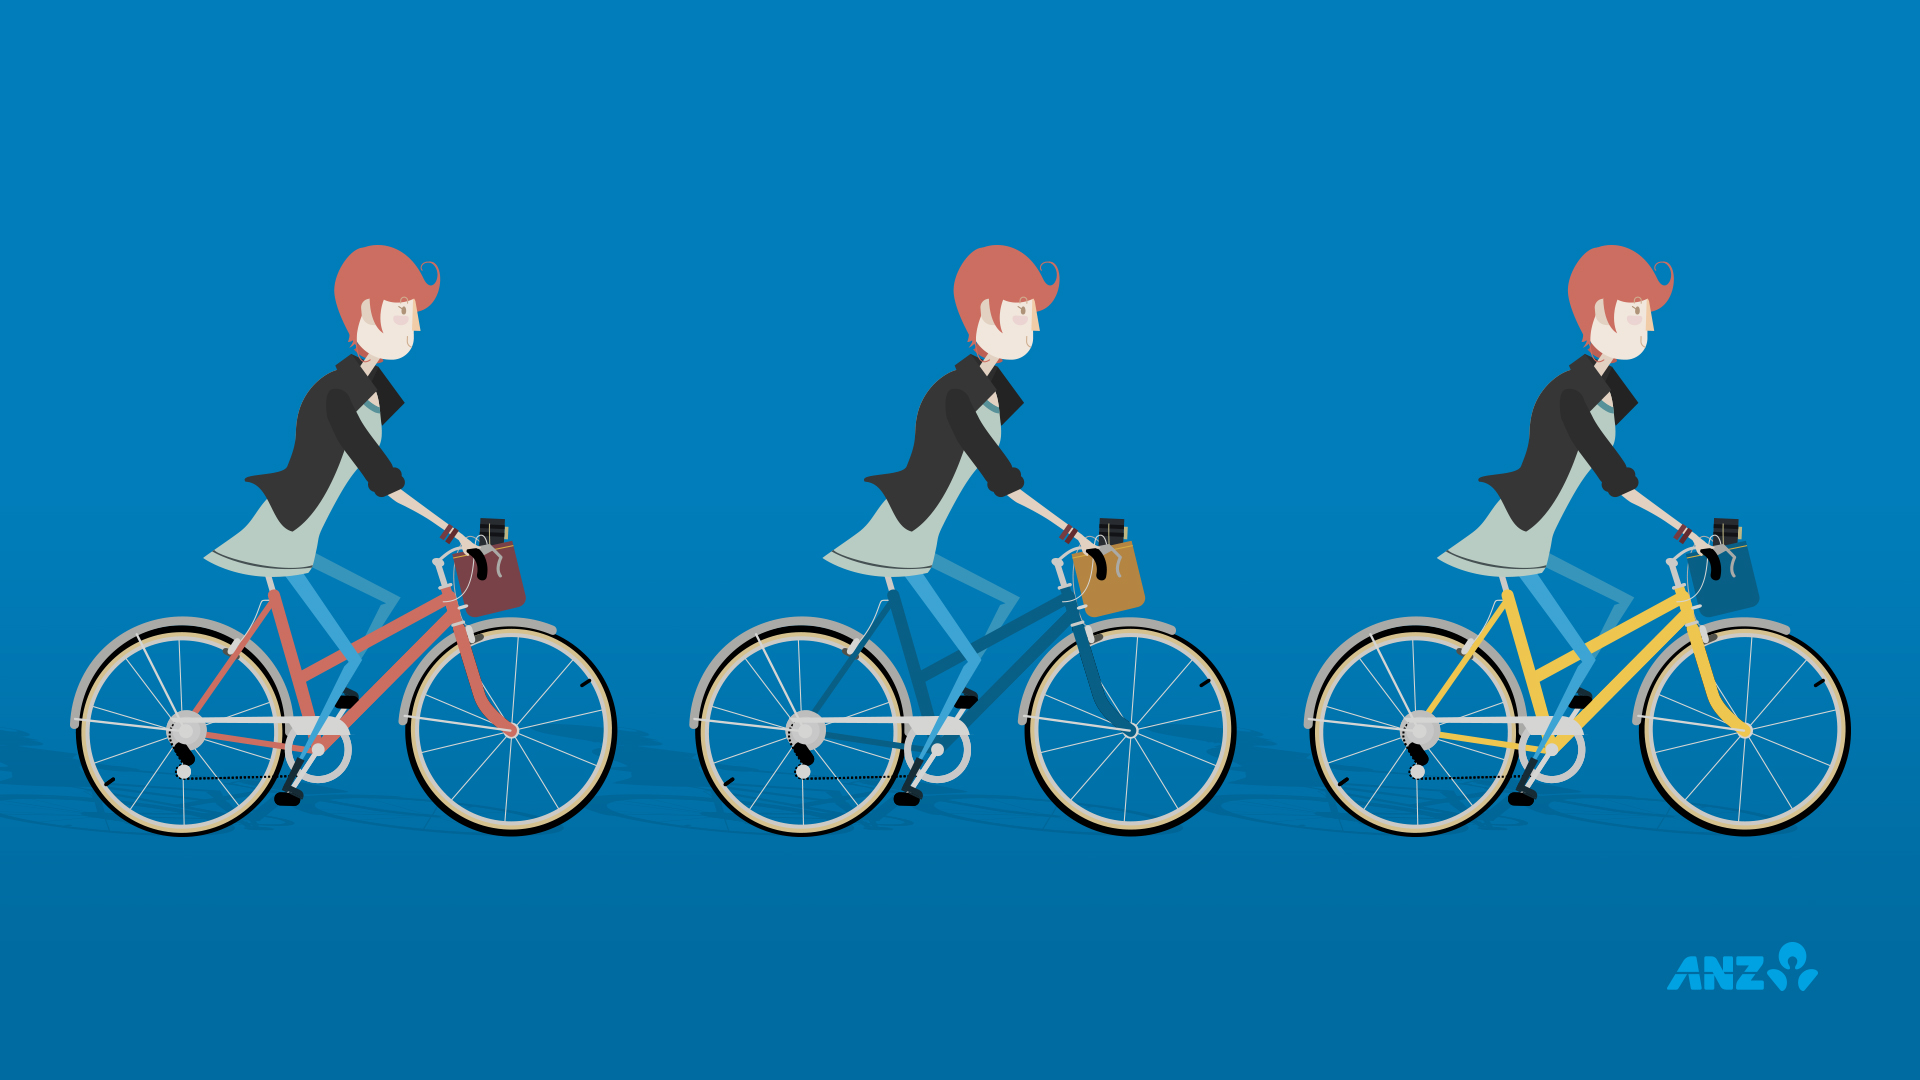 bike_color_choices.jpg